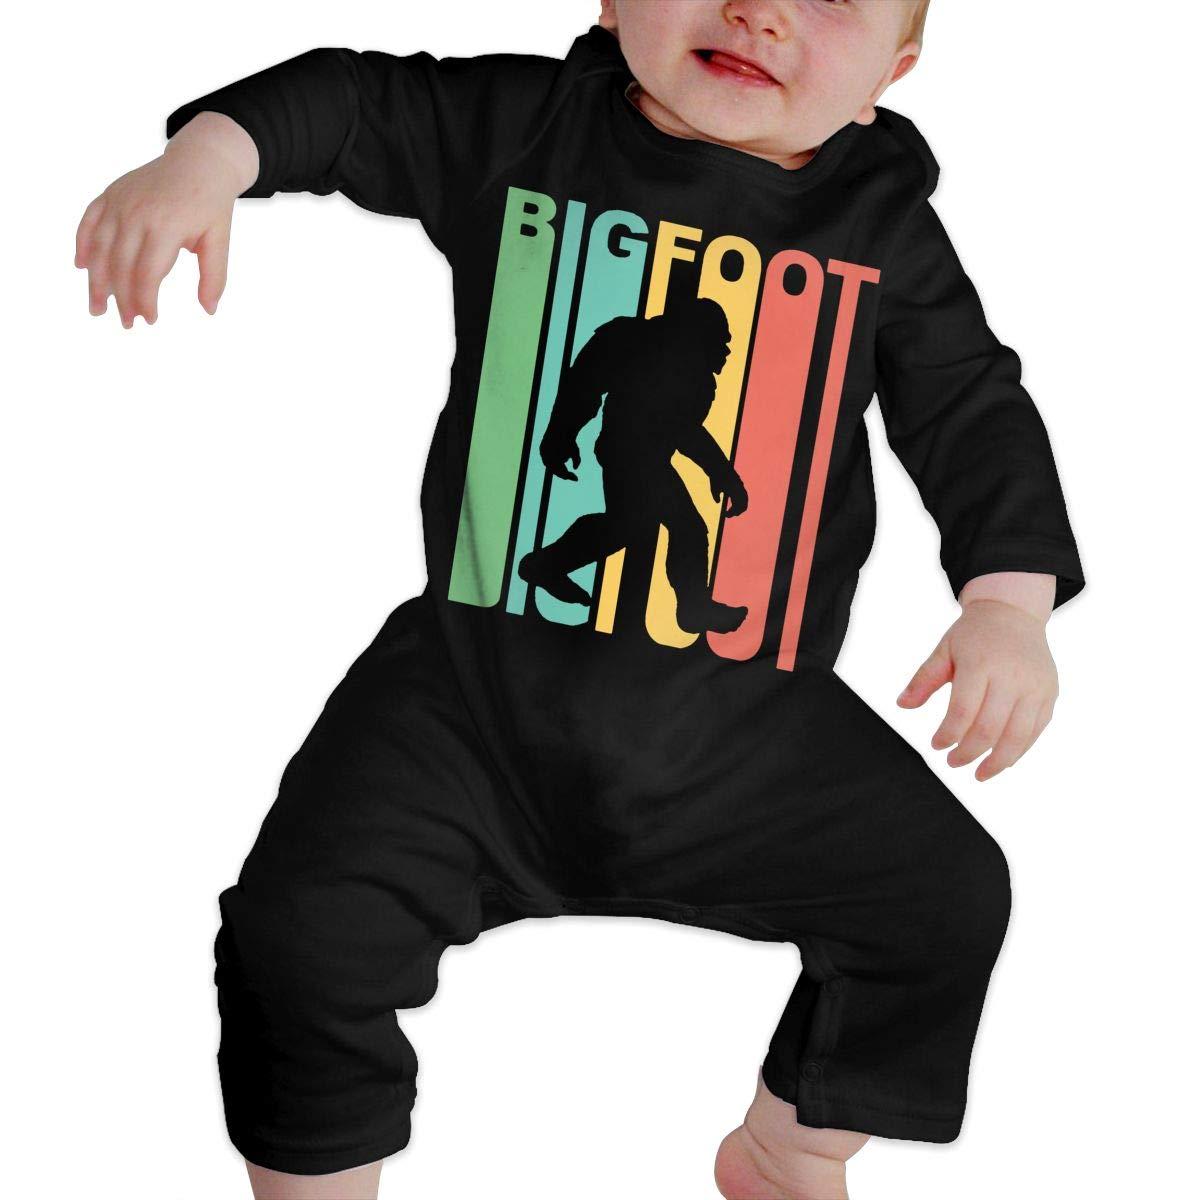 Long Sleeve Cotton Rompers for Baby Girls Boys Cute Rainbow Bigfoot Silhouette Sleepwear